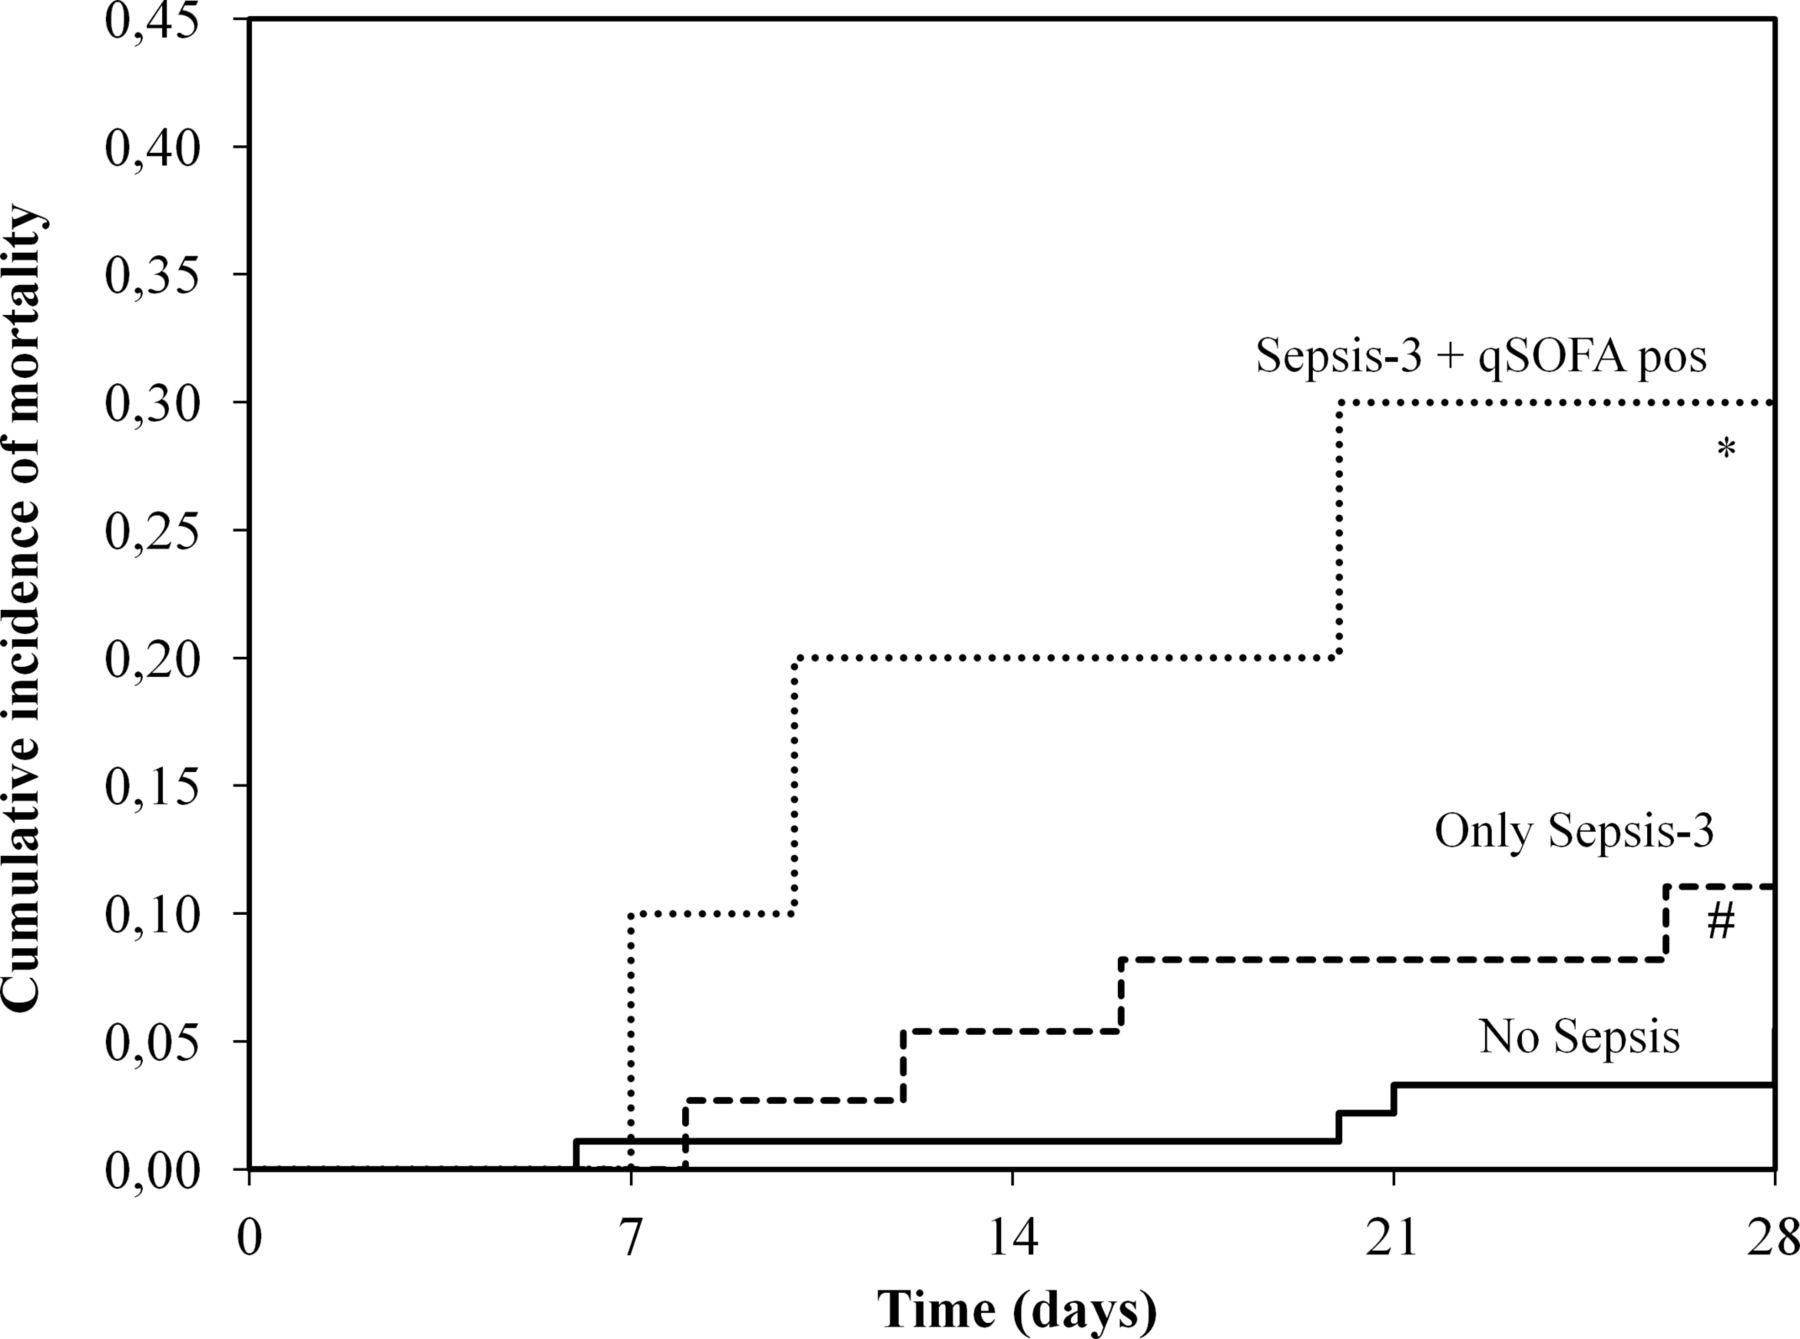 sofa score mortality pdf juventus vs atalanta sofascore assessment of sepsis 3 criteria and quick in patients